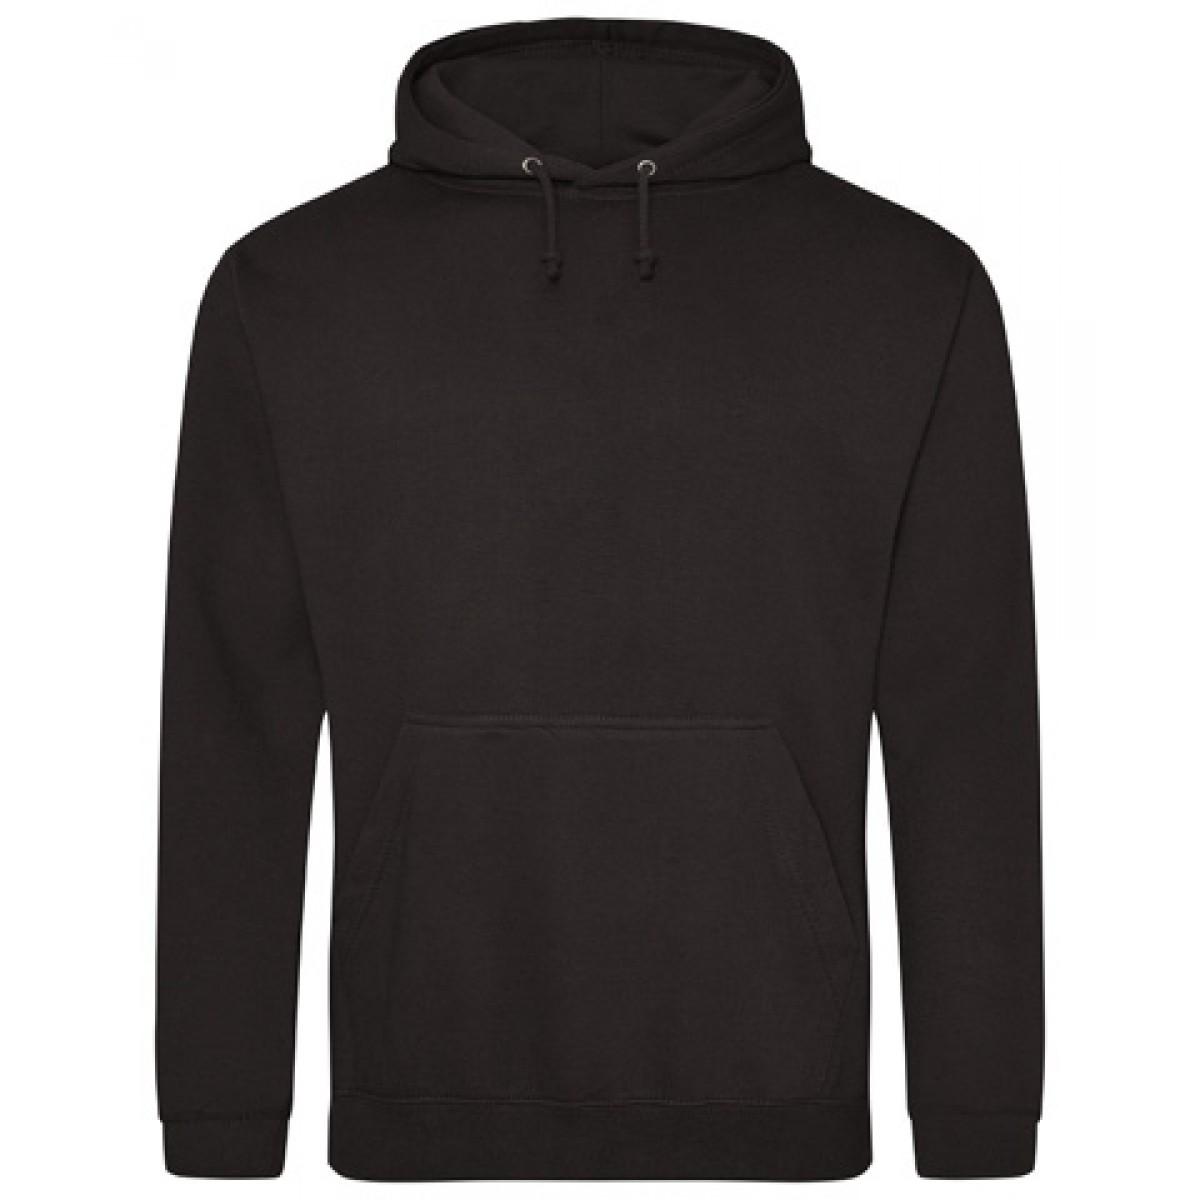 Hooded Sweatshirt 50/50 Heavy Blend-Black-S